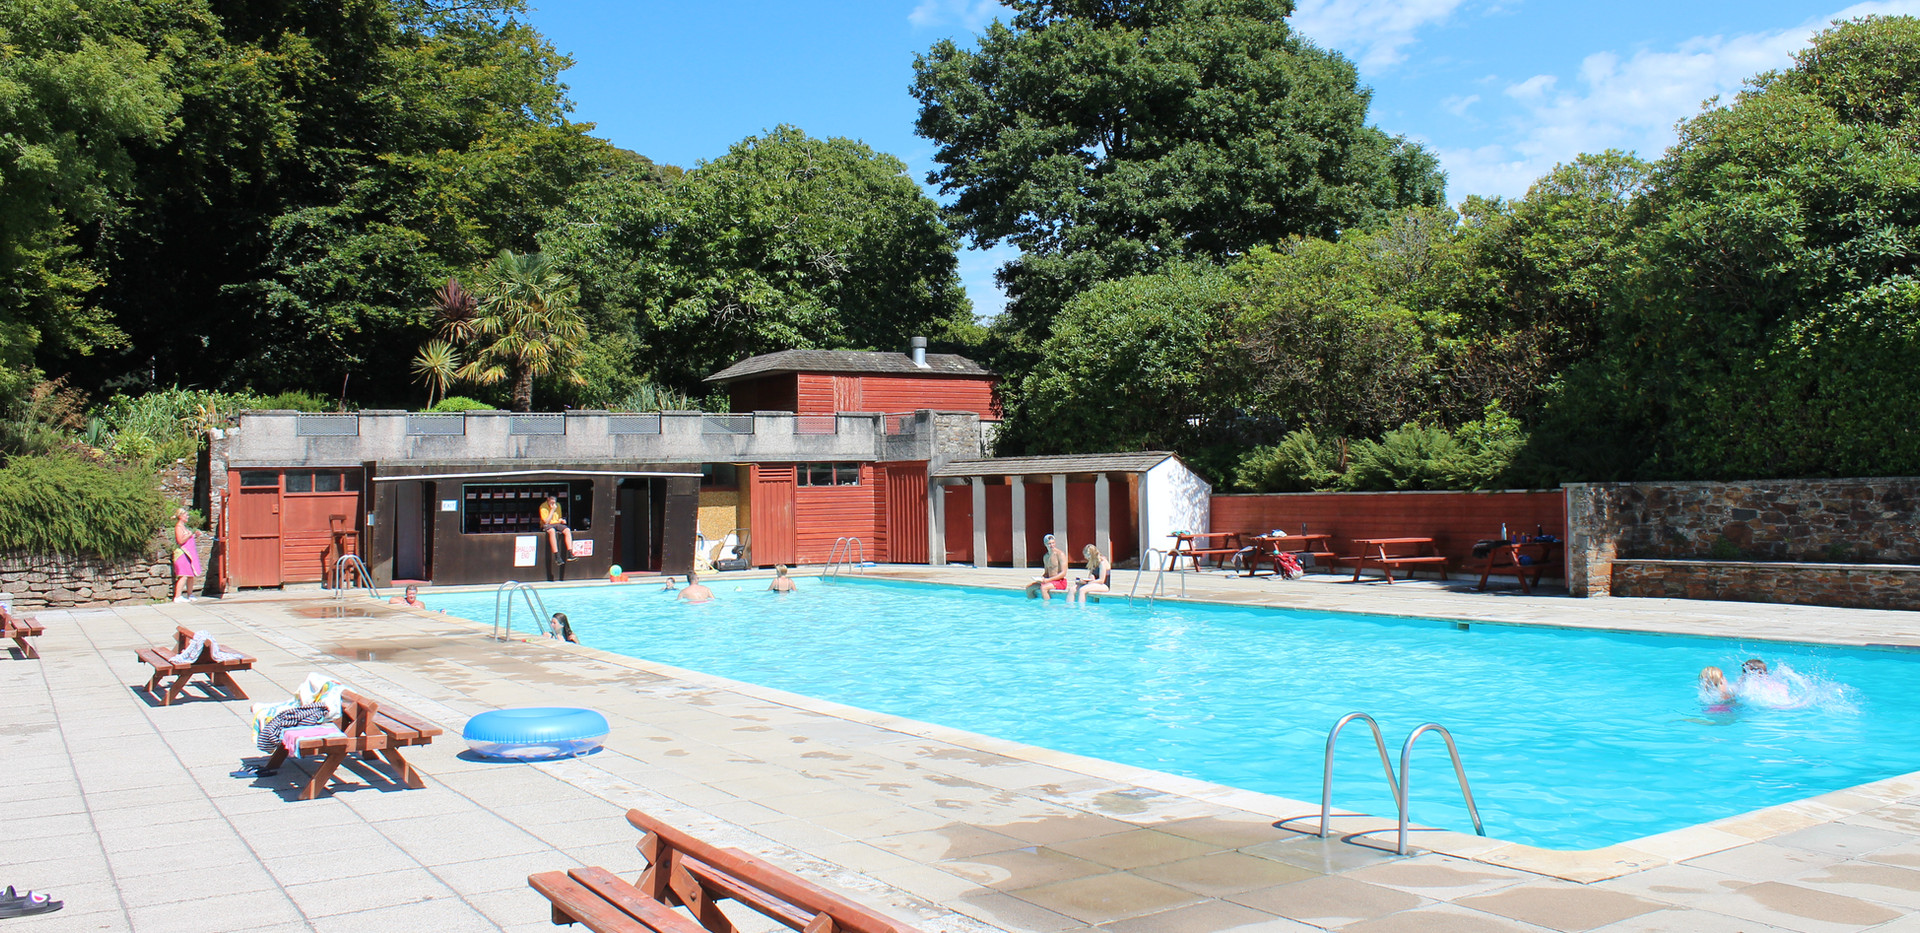 25m Swimming Pool